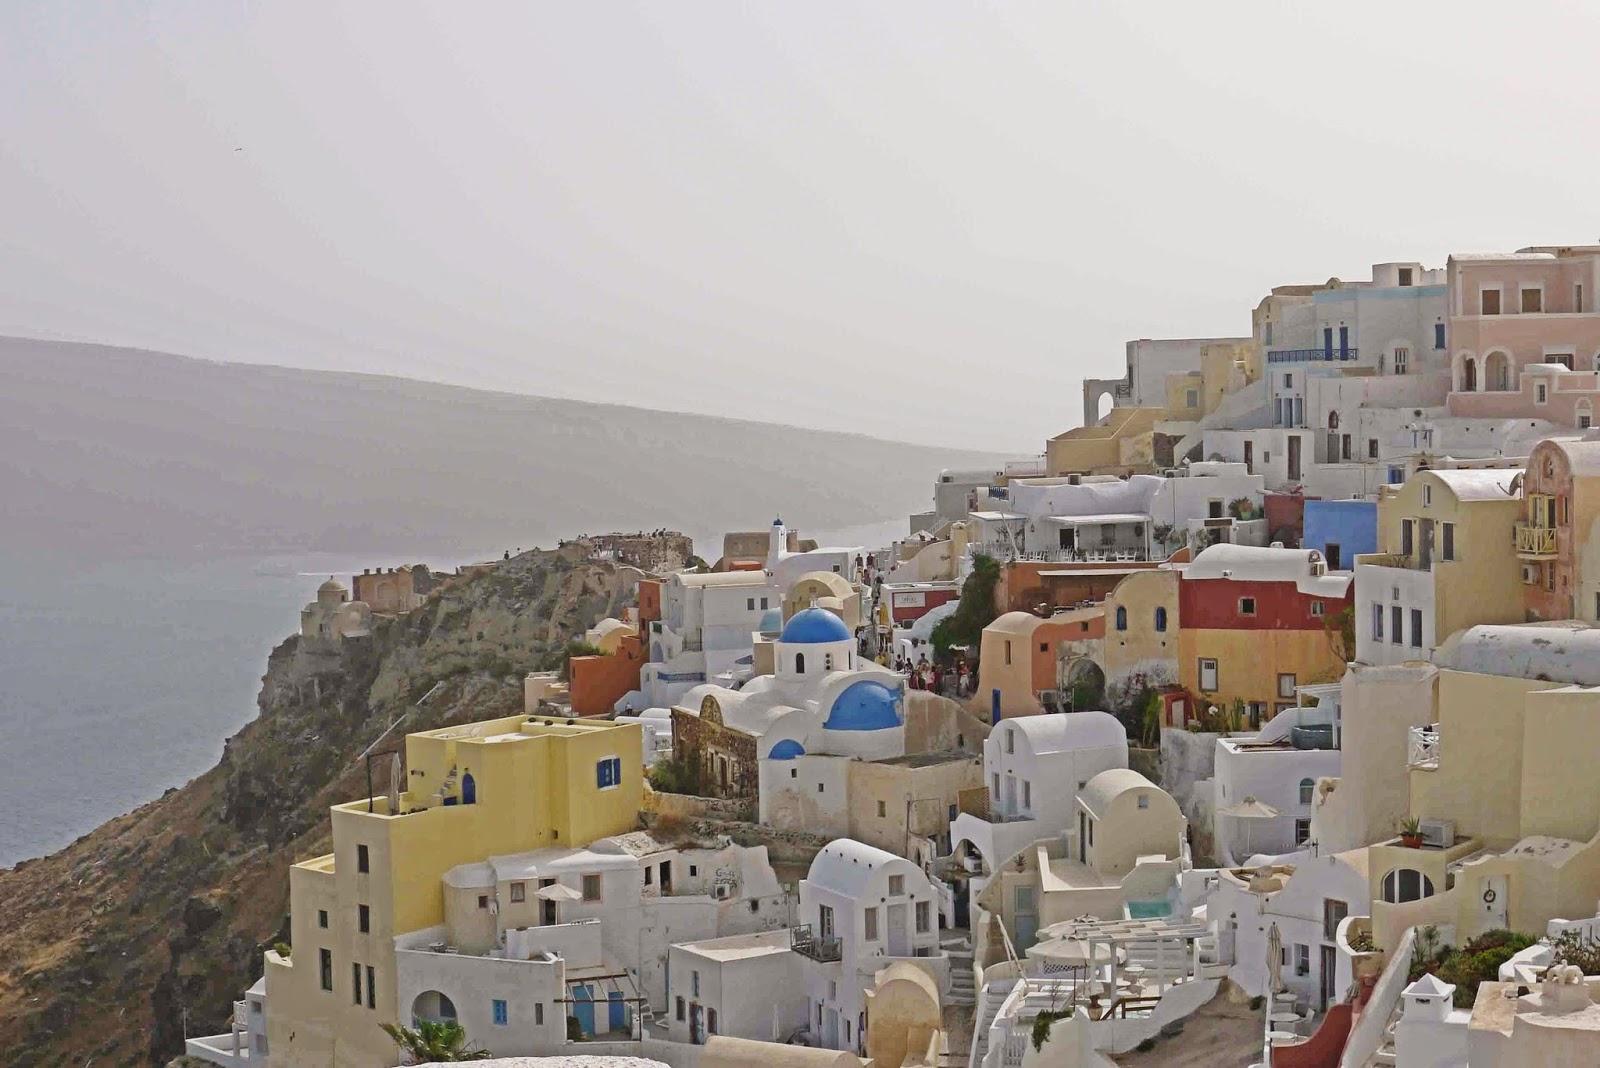 Oia Santorini